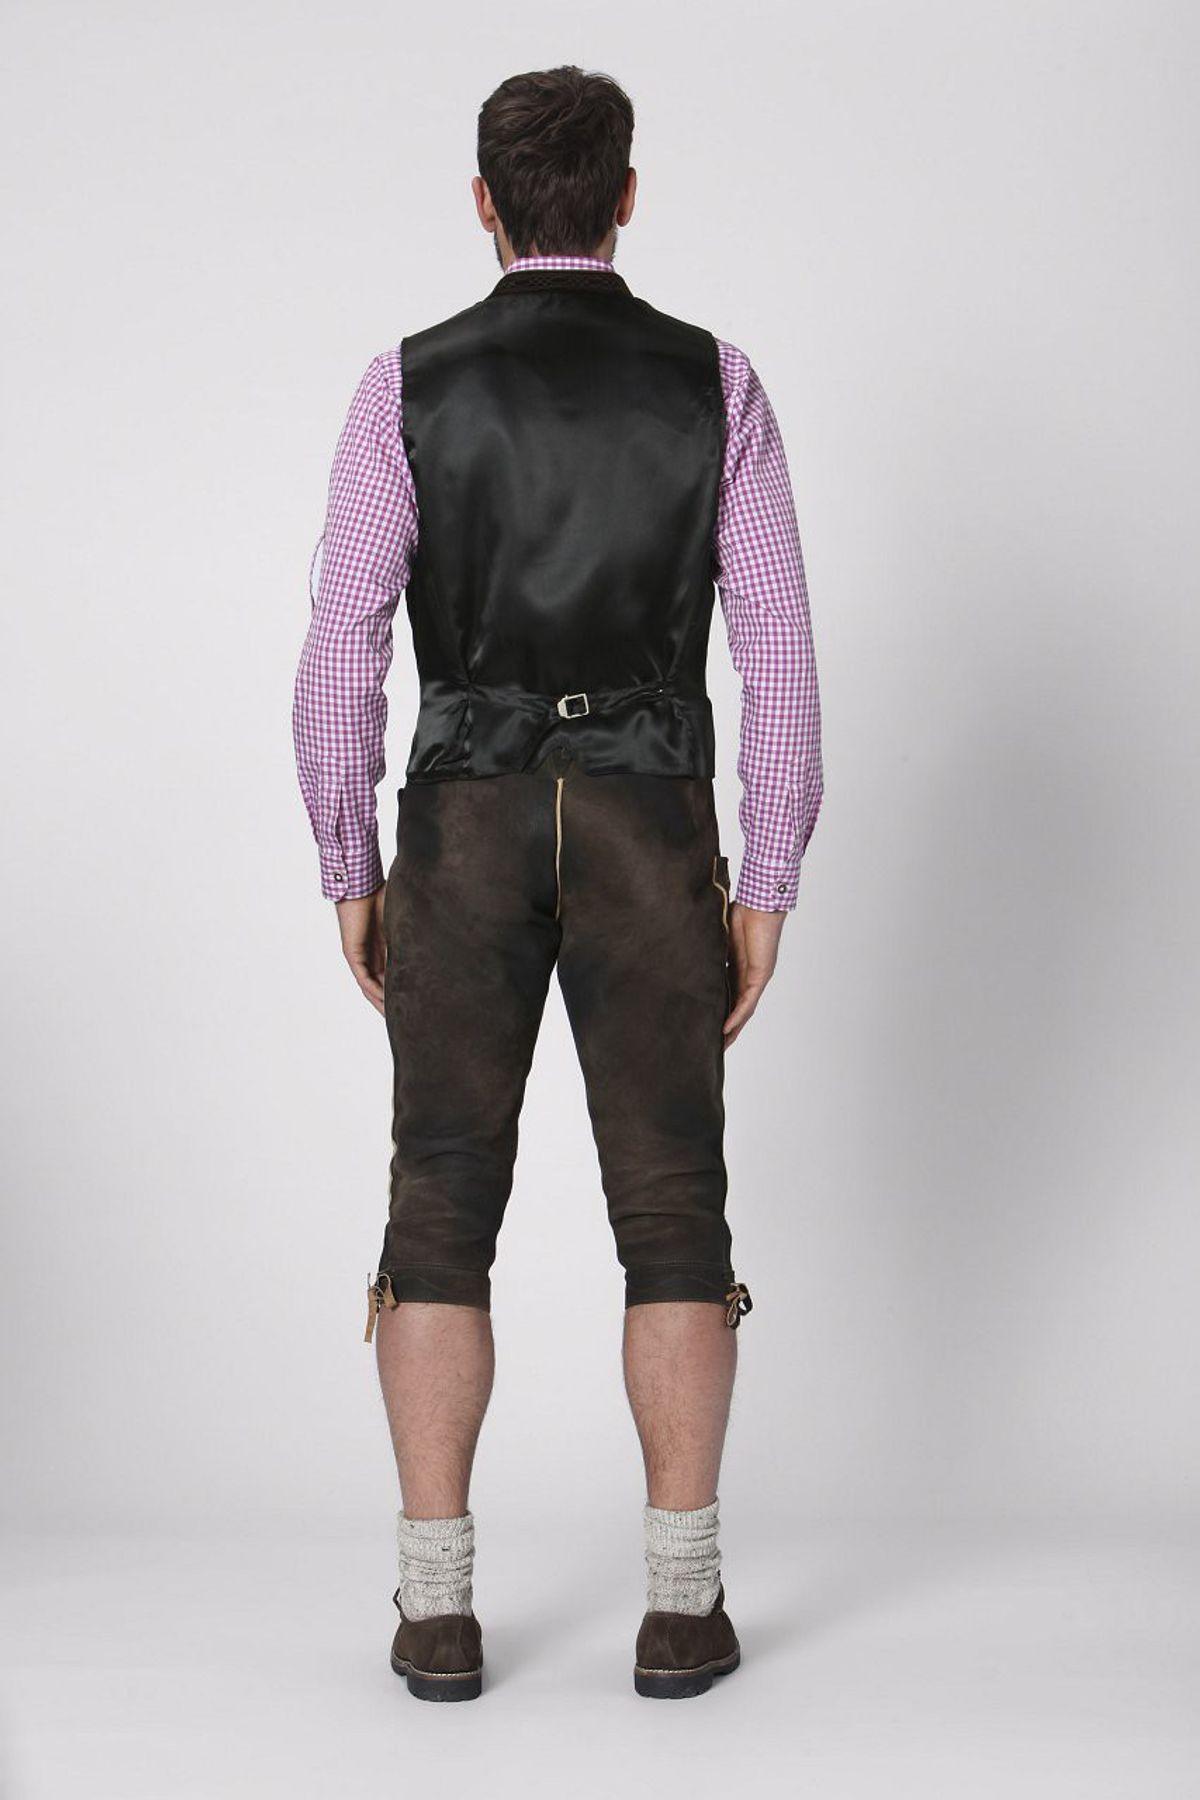 Stockerpoint - Herren Trachten Weste in verschiedenen Farbtönen, Calzado – Bild 4